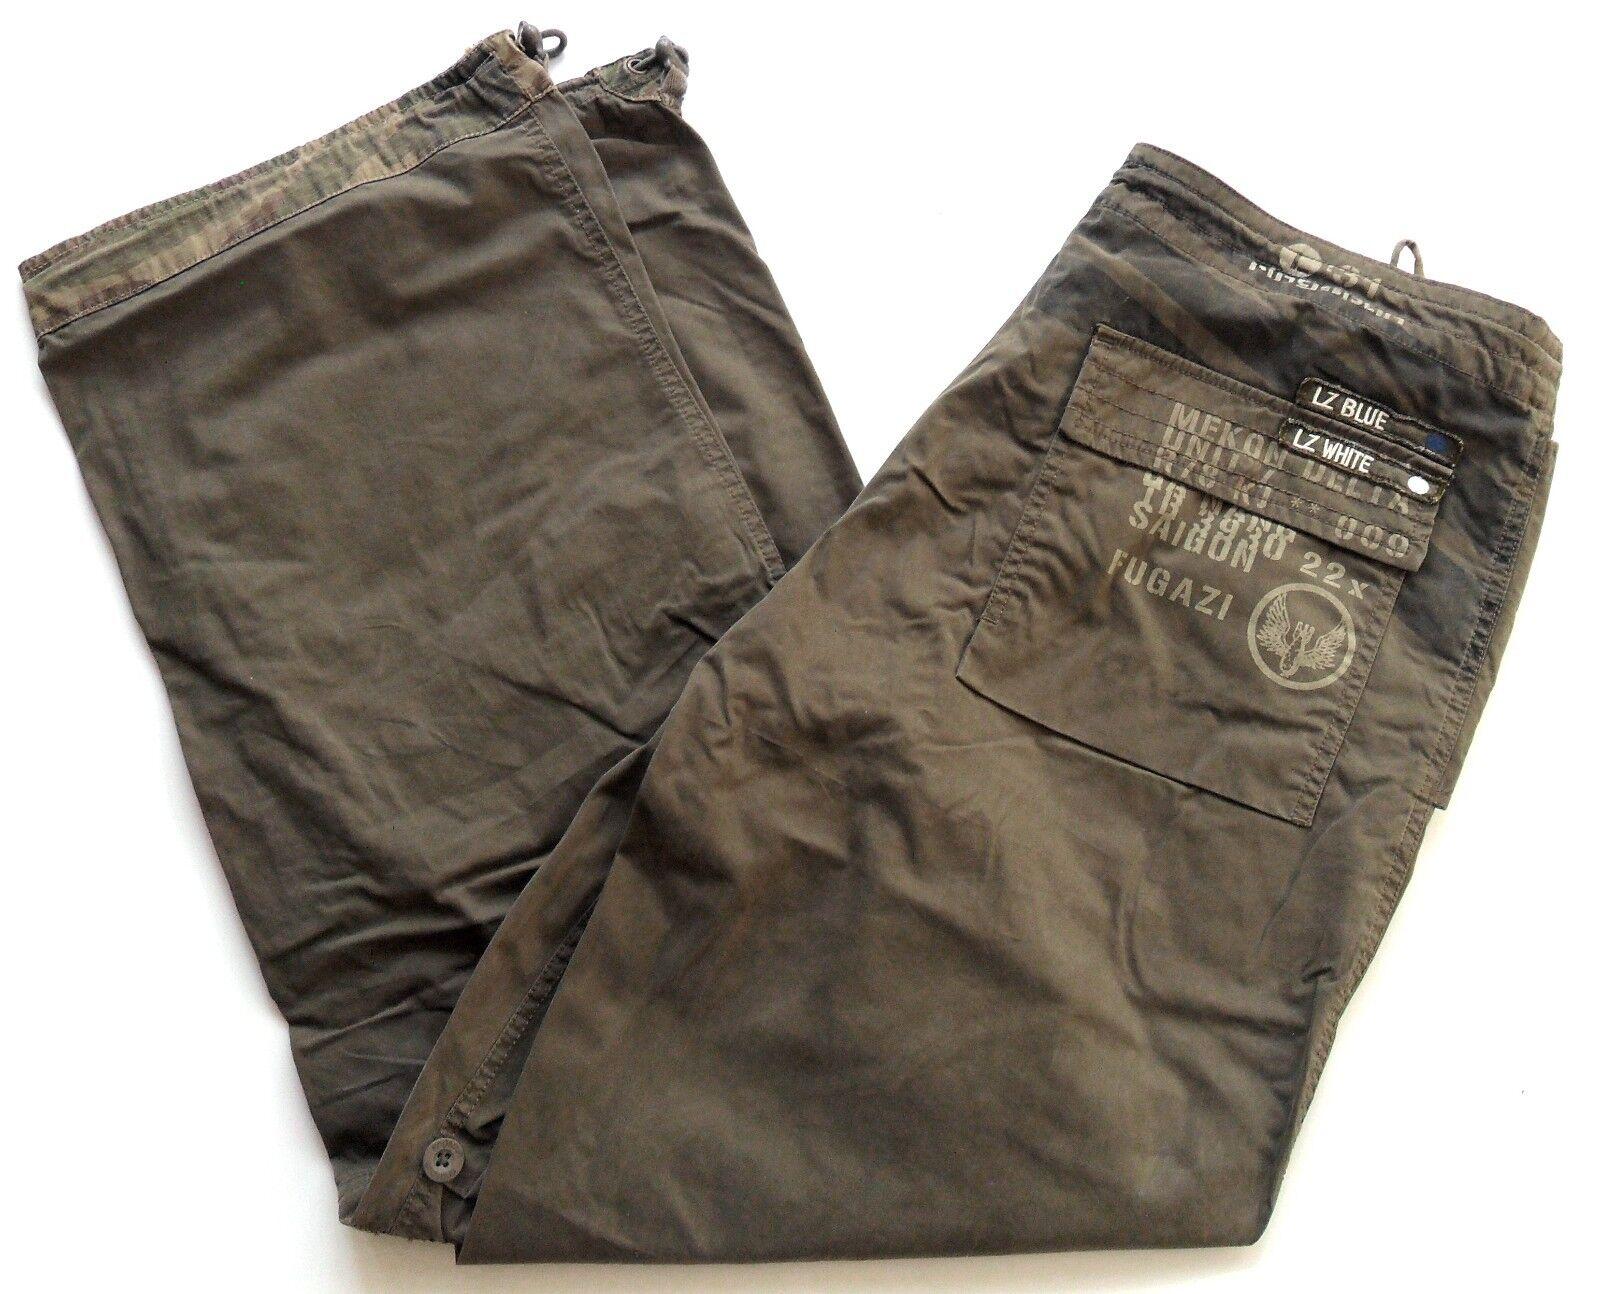 RINGSPUN Men's Pants roll up to Shorts Cotton Blend Snow Khaki Sizes  M,L,XL